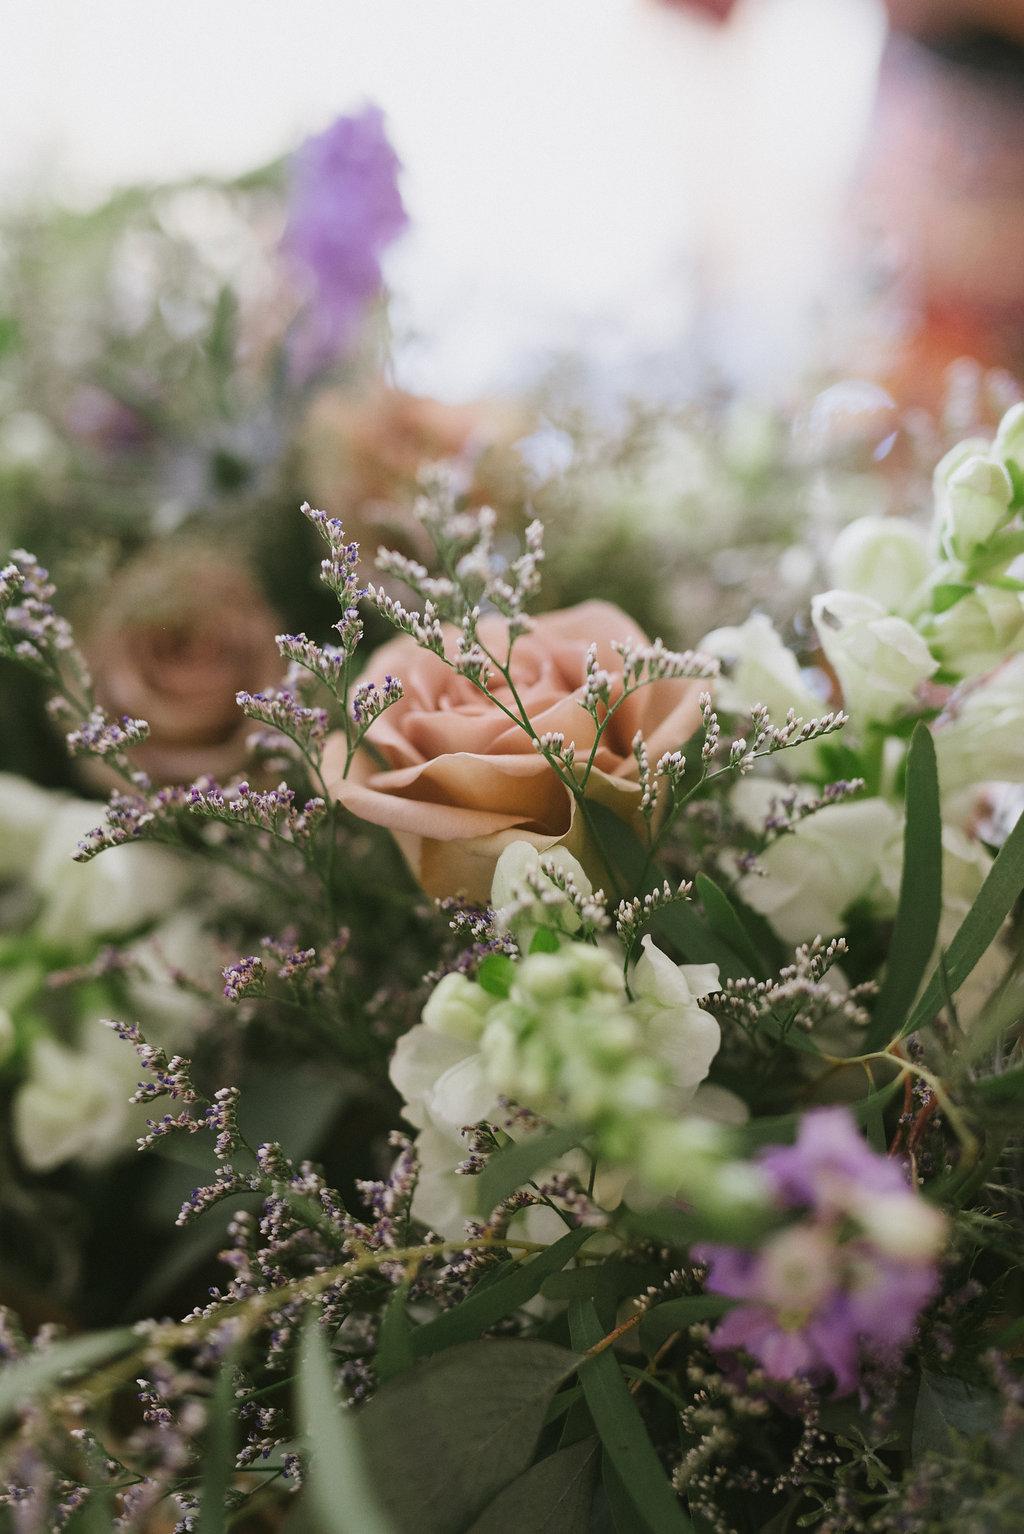 Amnesia Rose Bridal Bouquet - Winnipeg Wedding Flowers